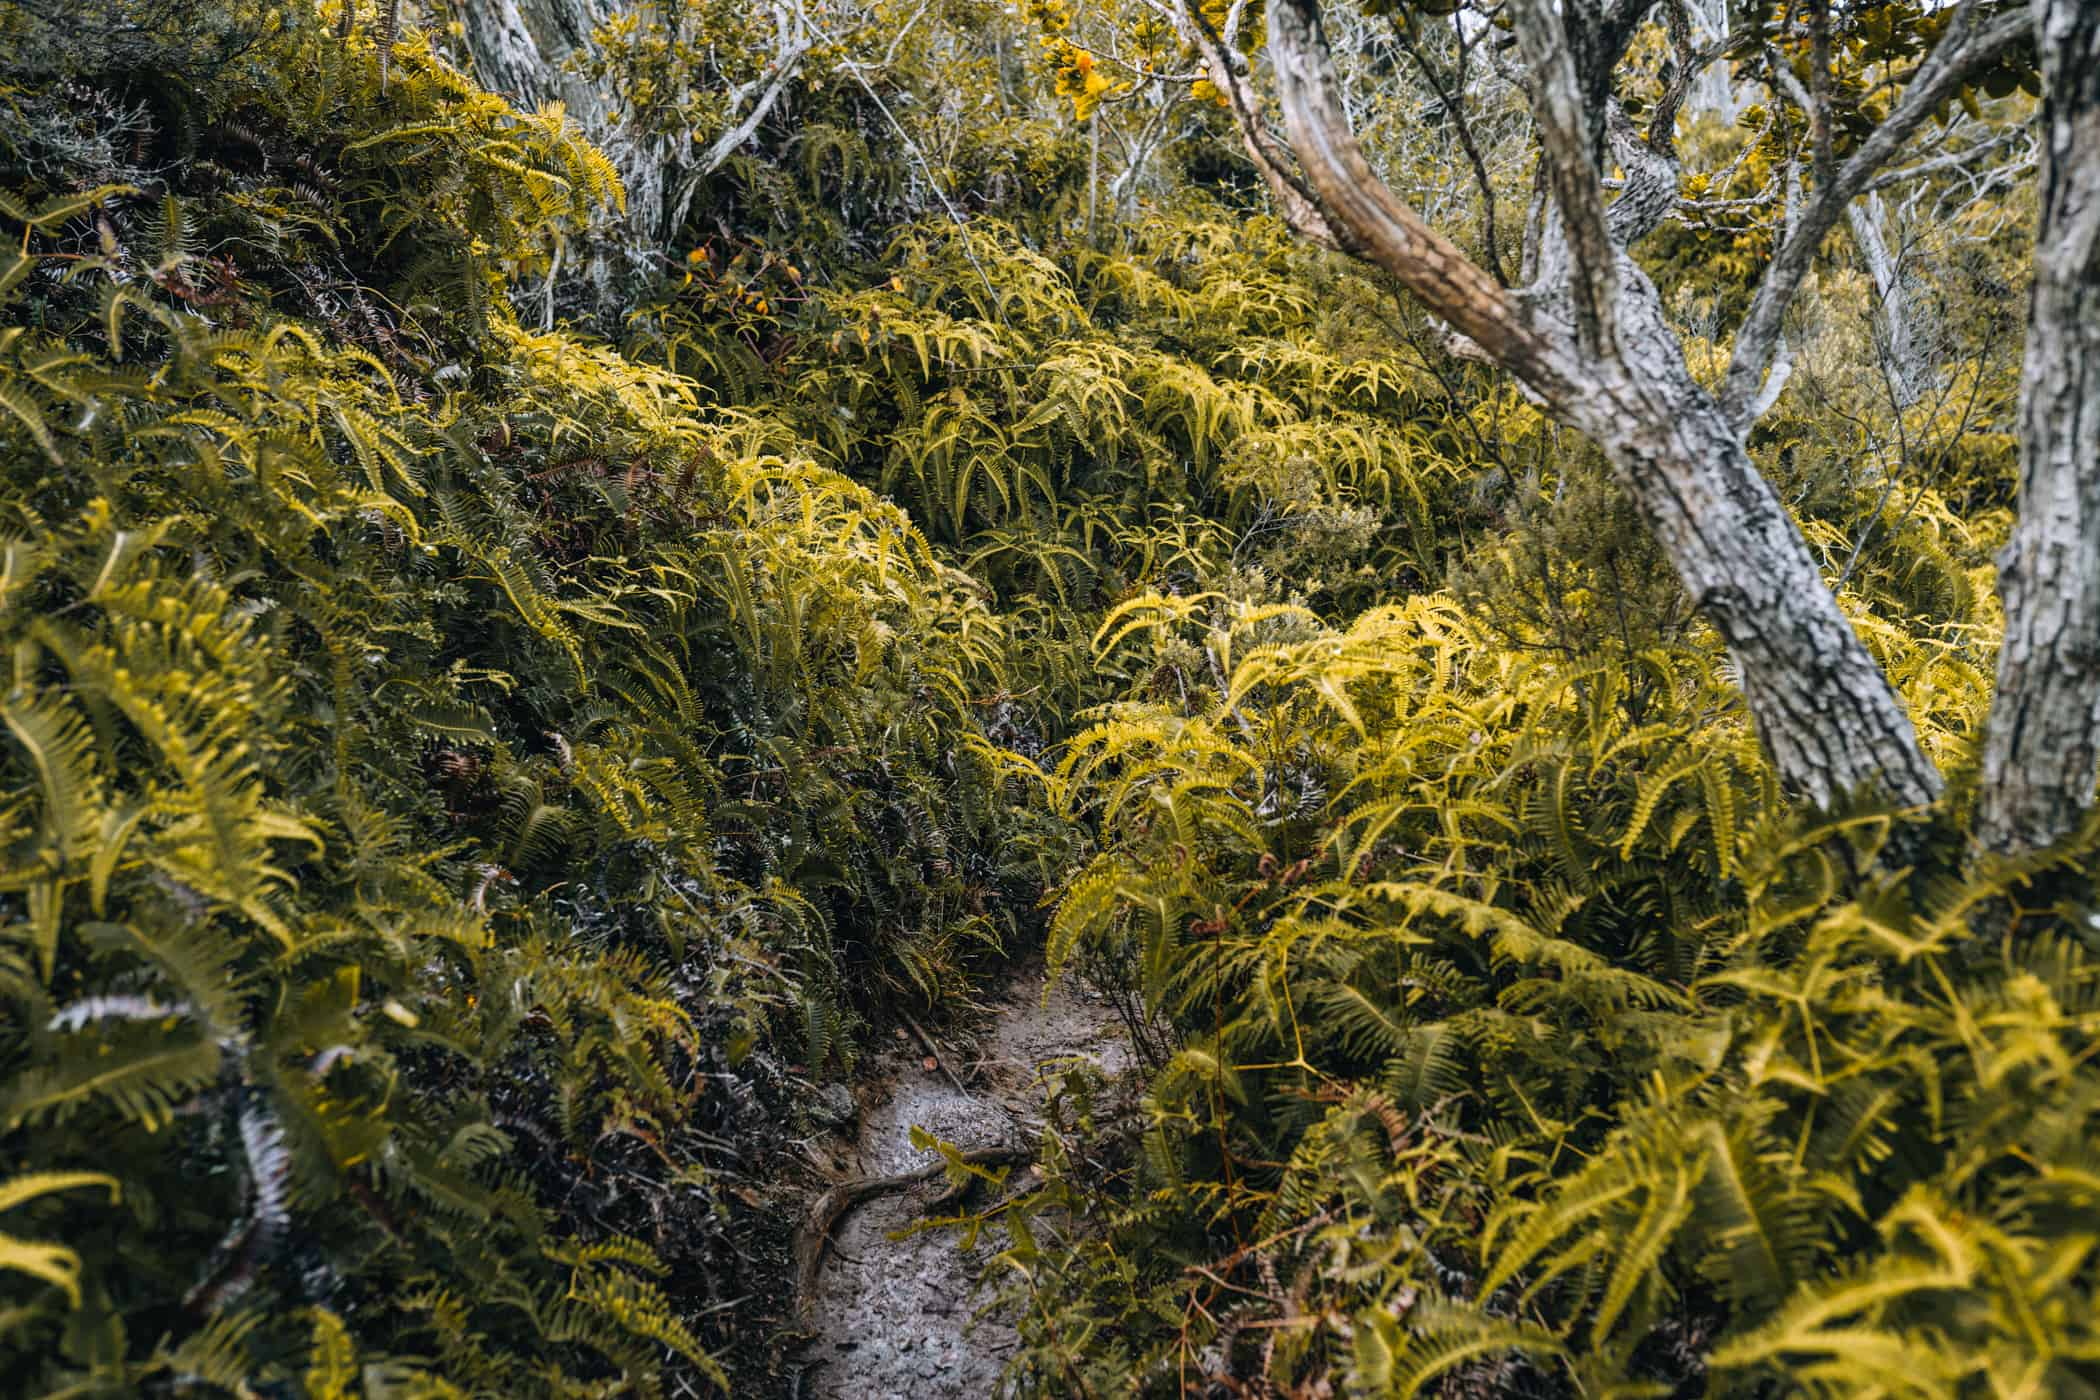 Kauai - Strände, Wandern & Ausflugsziele: Kalepa Ridge Trail